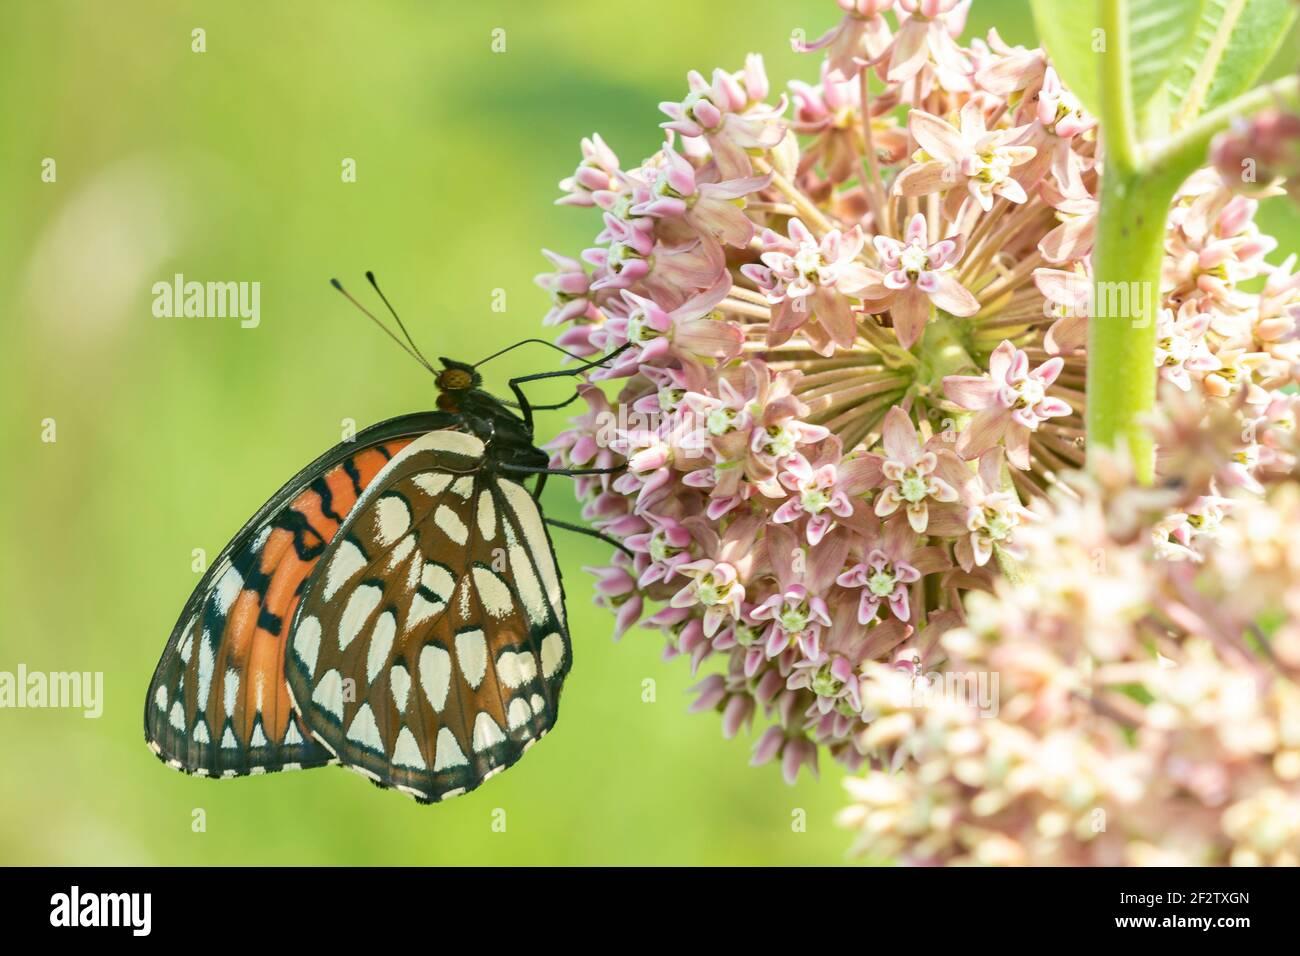 03325-00602 Regal Fritillary (Speyeria idalia) Weibchen auf gemeiner Milchblume (Asclepias syriaca) Sand Prairie - Scrub Oak Nature Preserve Mason Co. IL Stockfoto